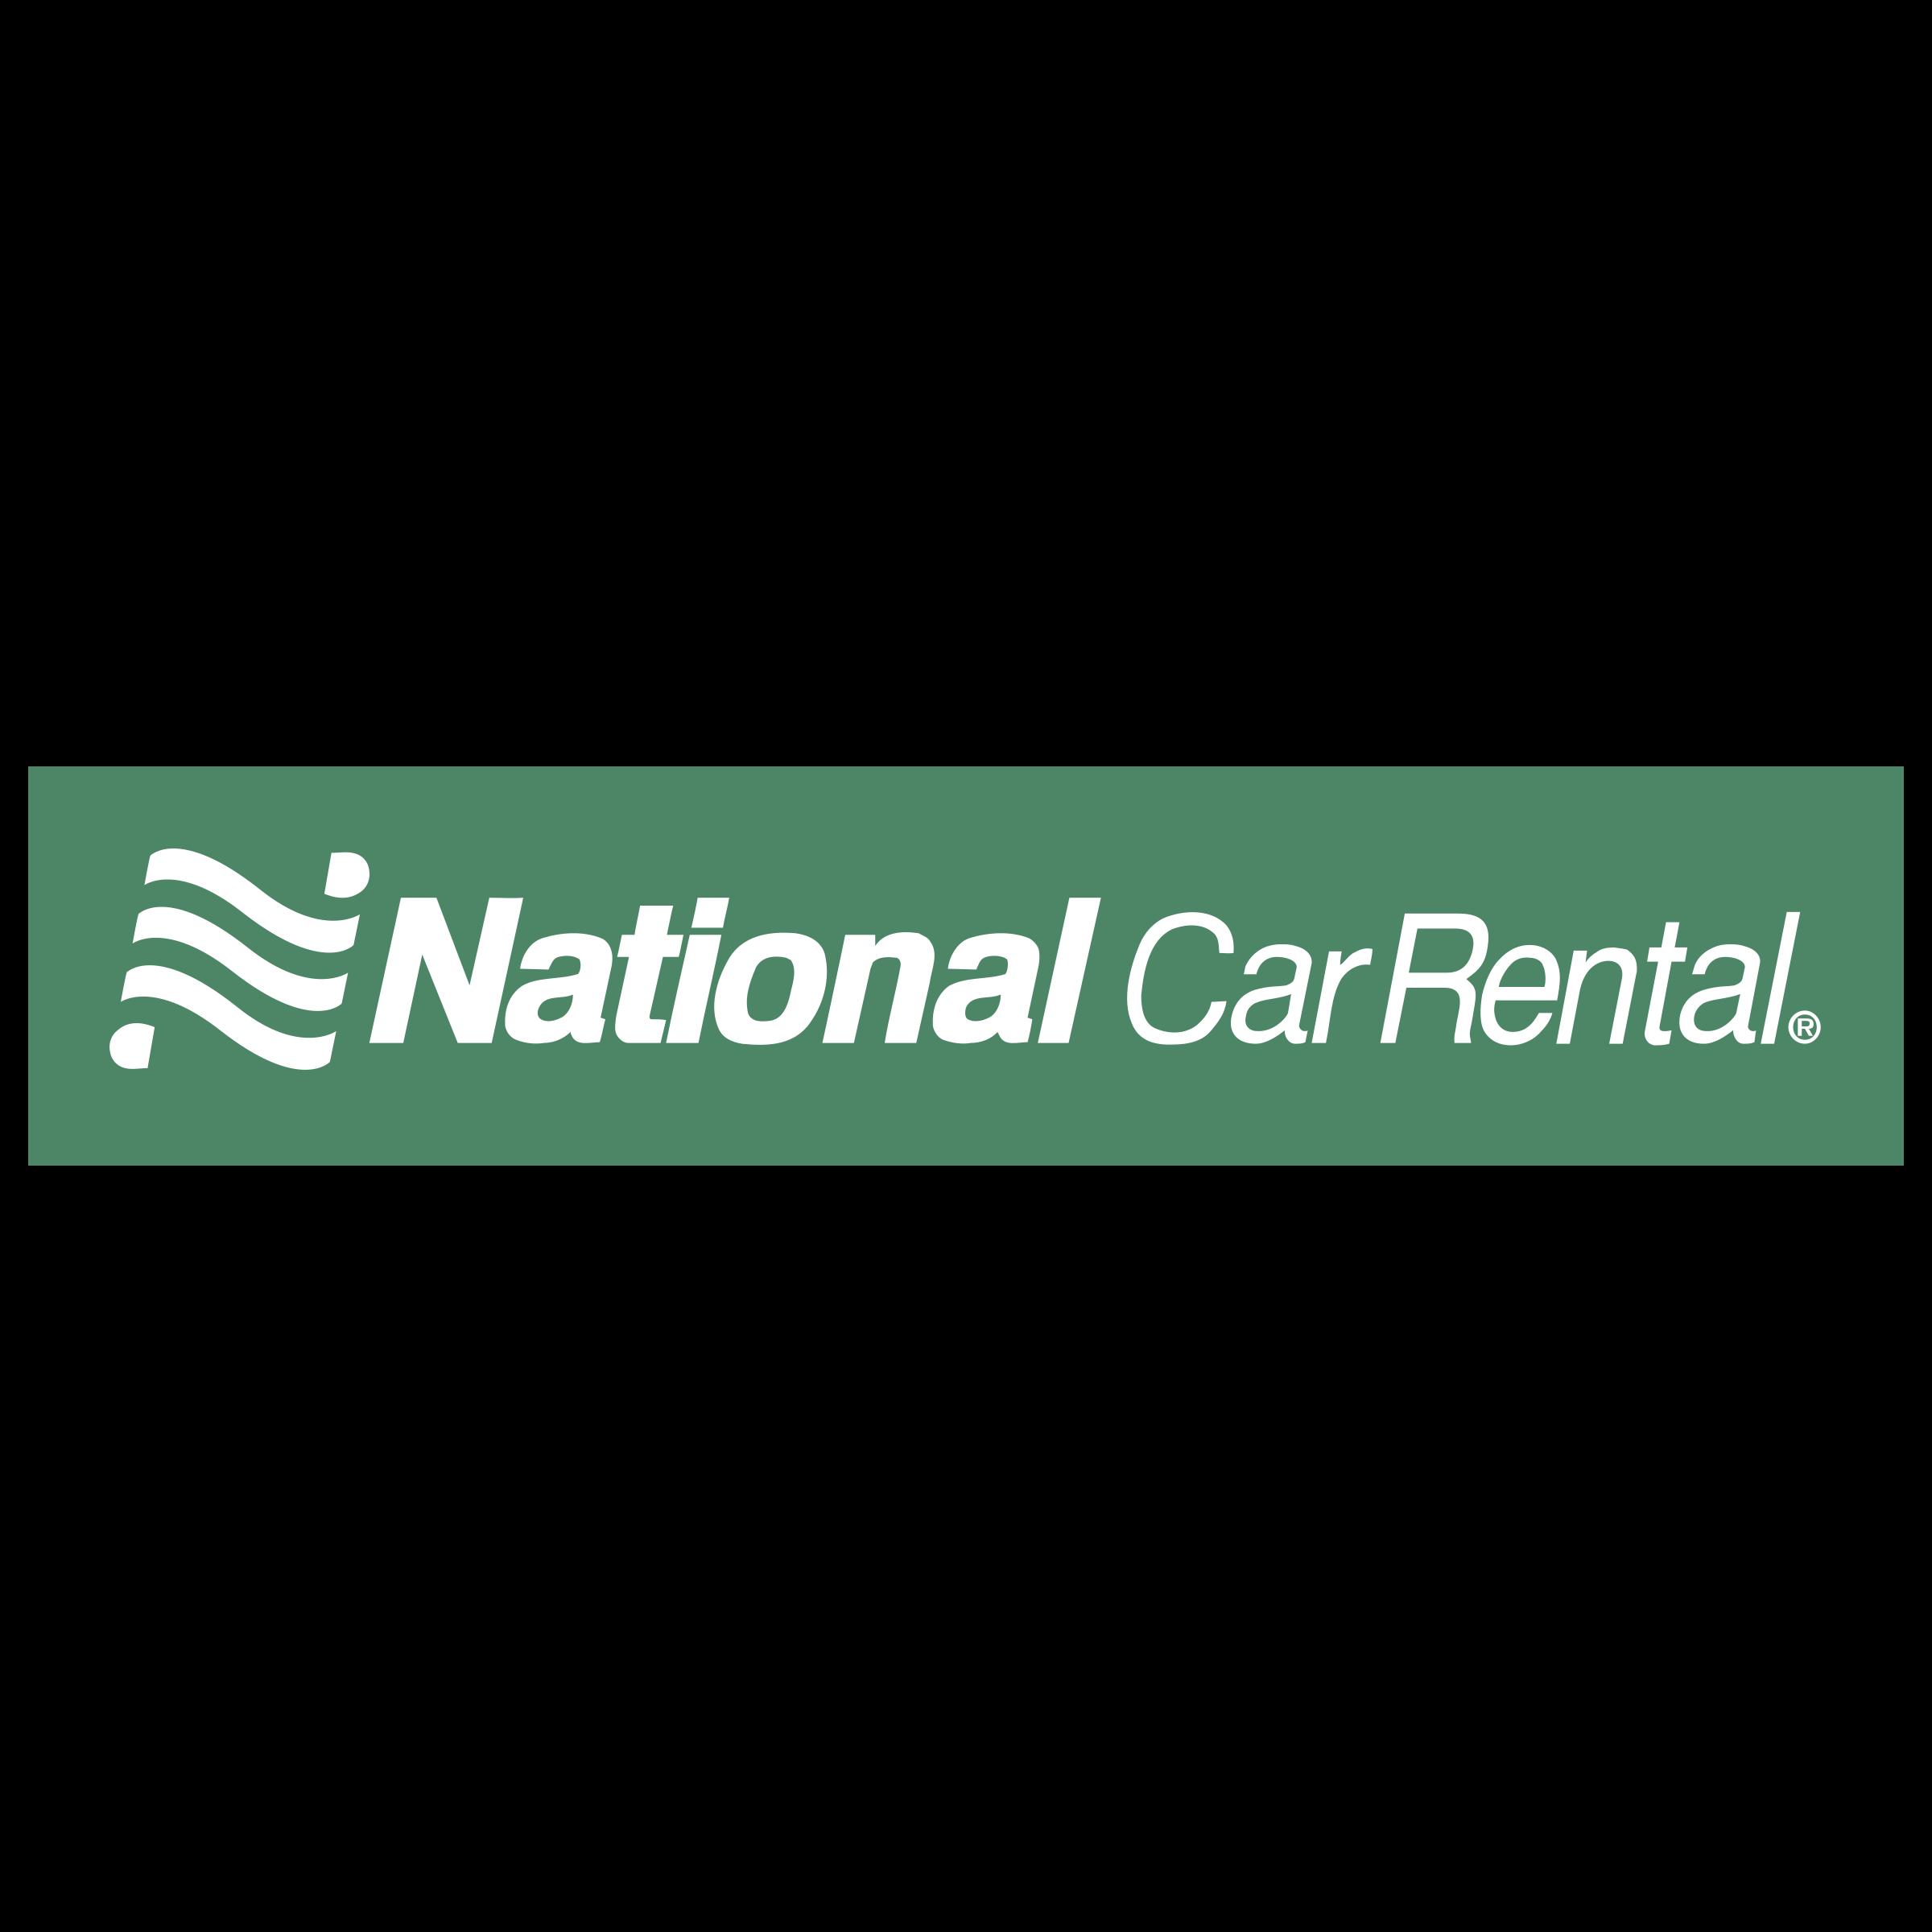 National Car Rental Logo PNG Transparent